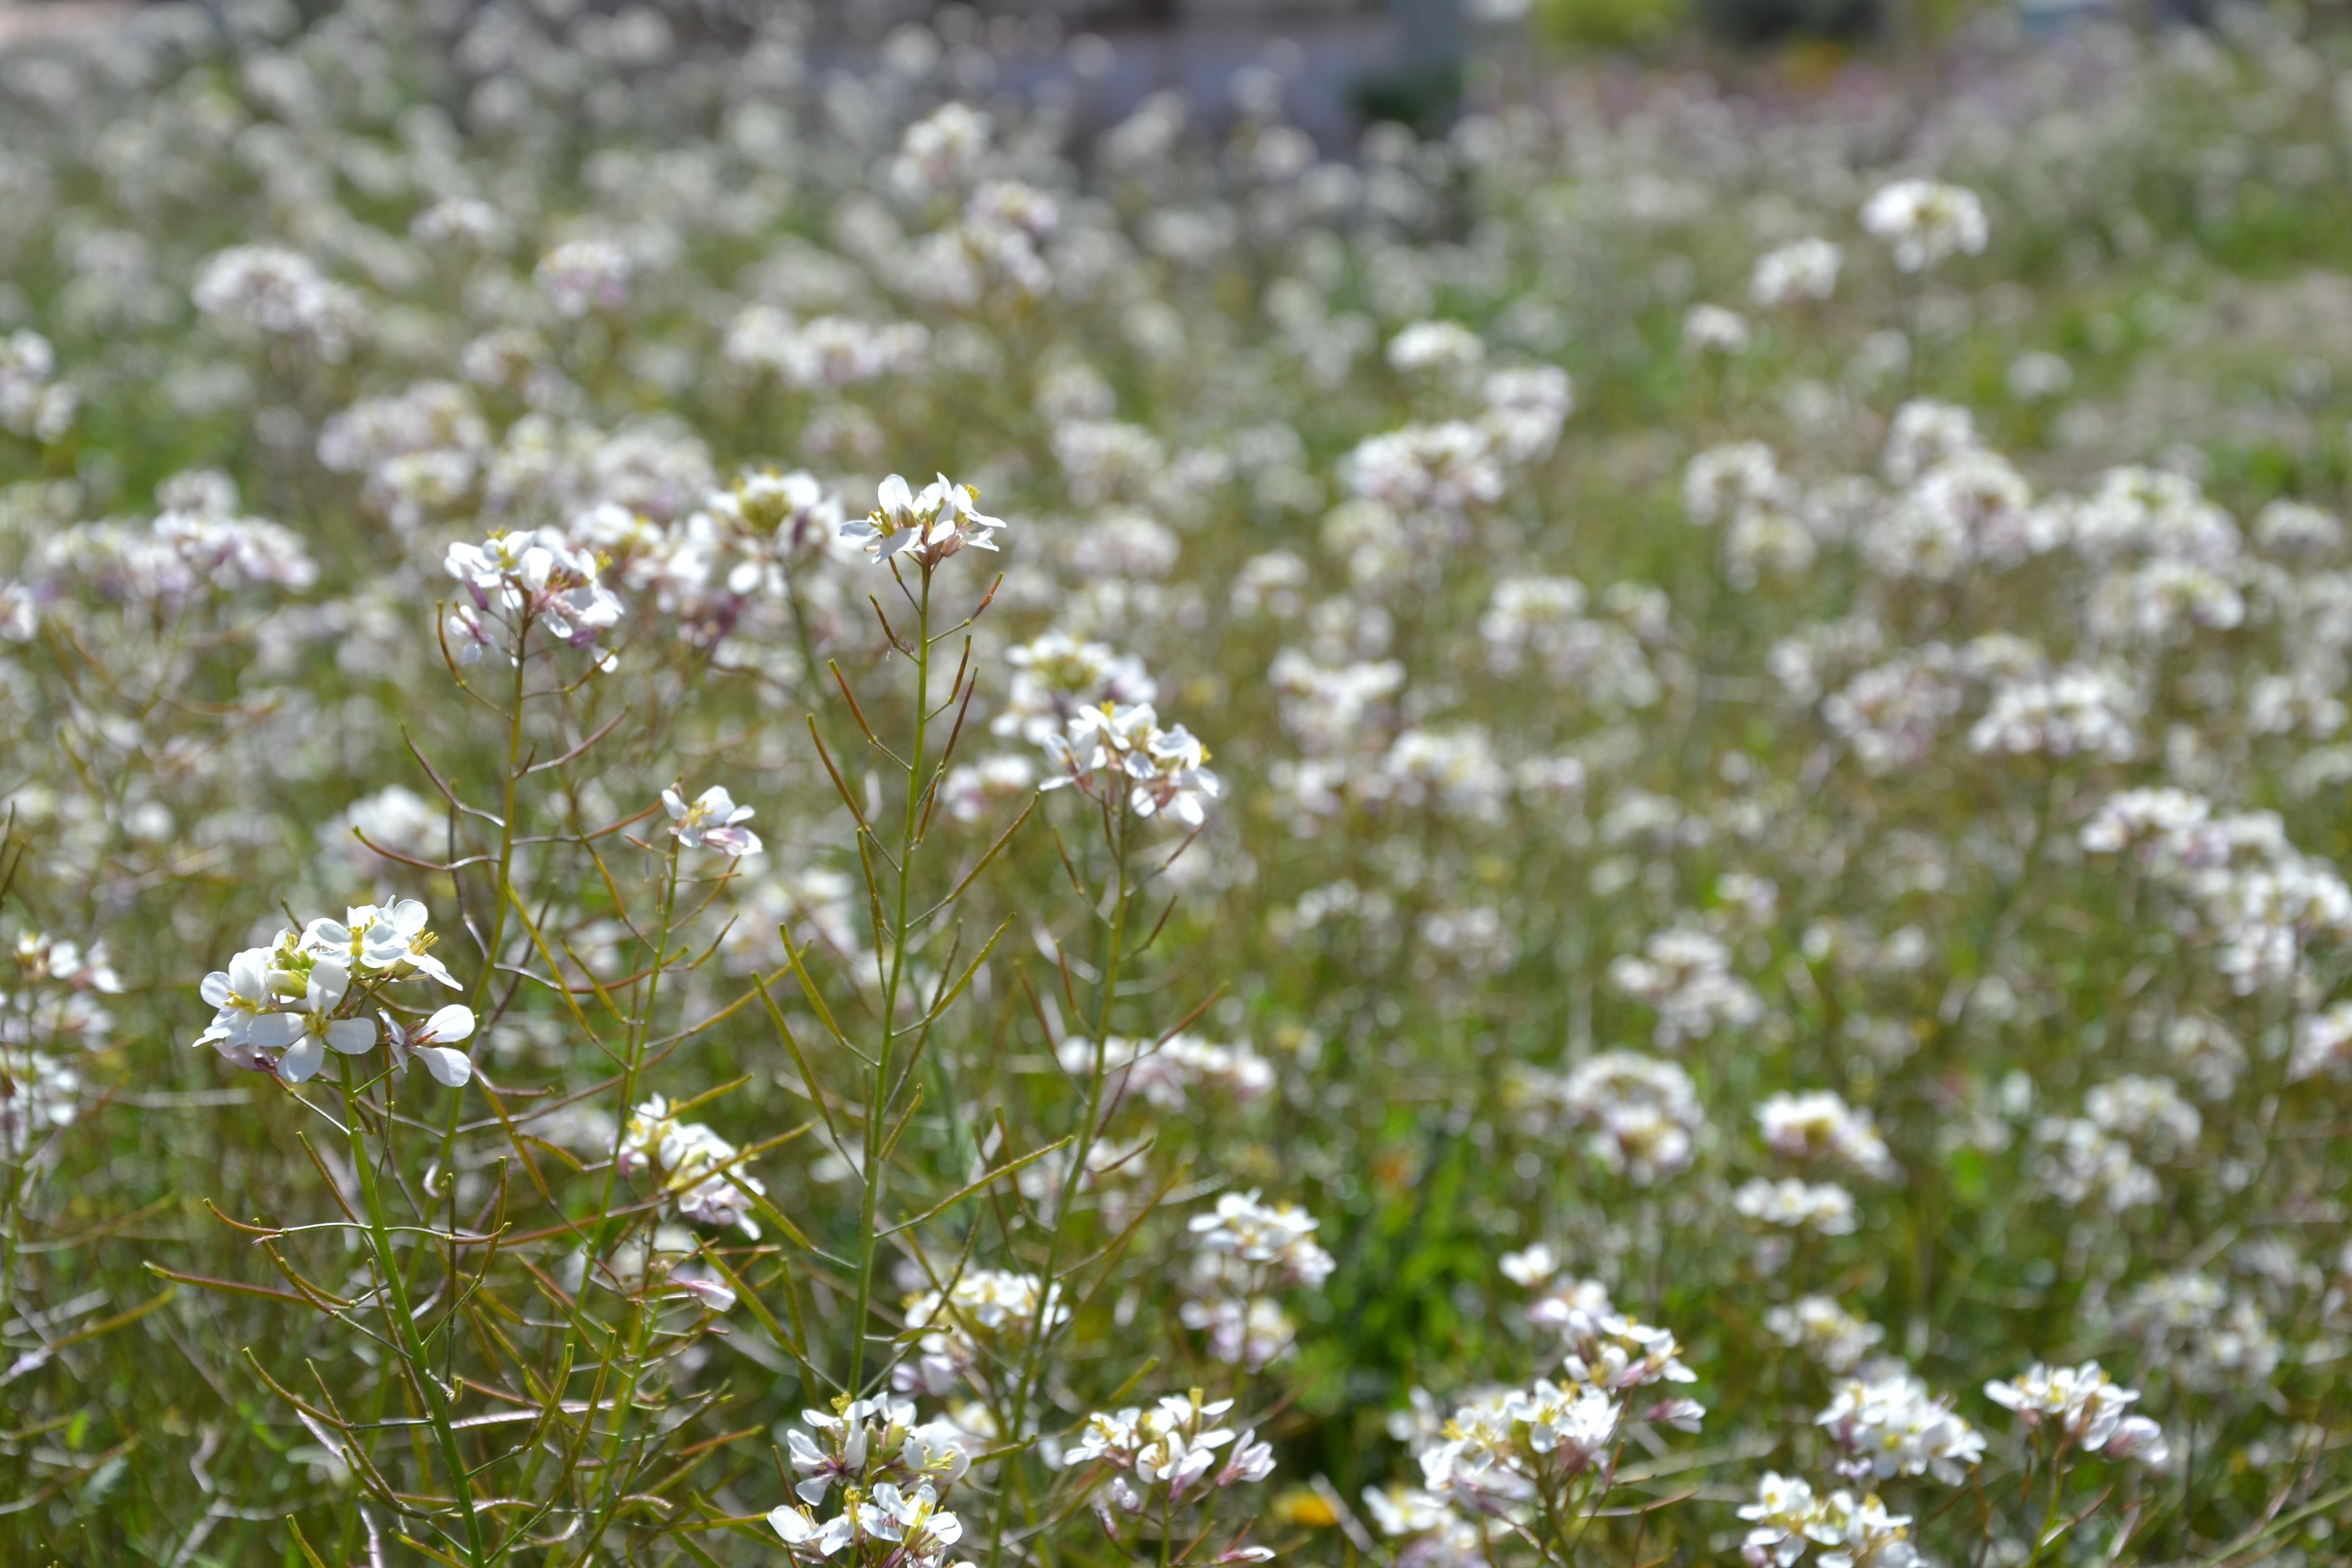 images gratuites paysage la nature herbe fleur champ. Black Bedroom Furniture Sets. Home Design Ideas